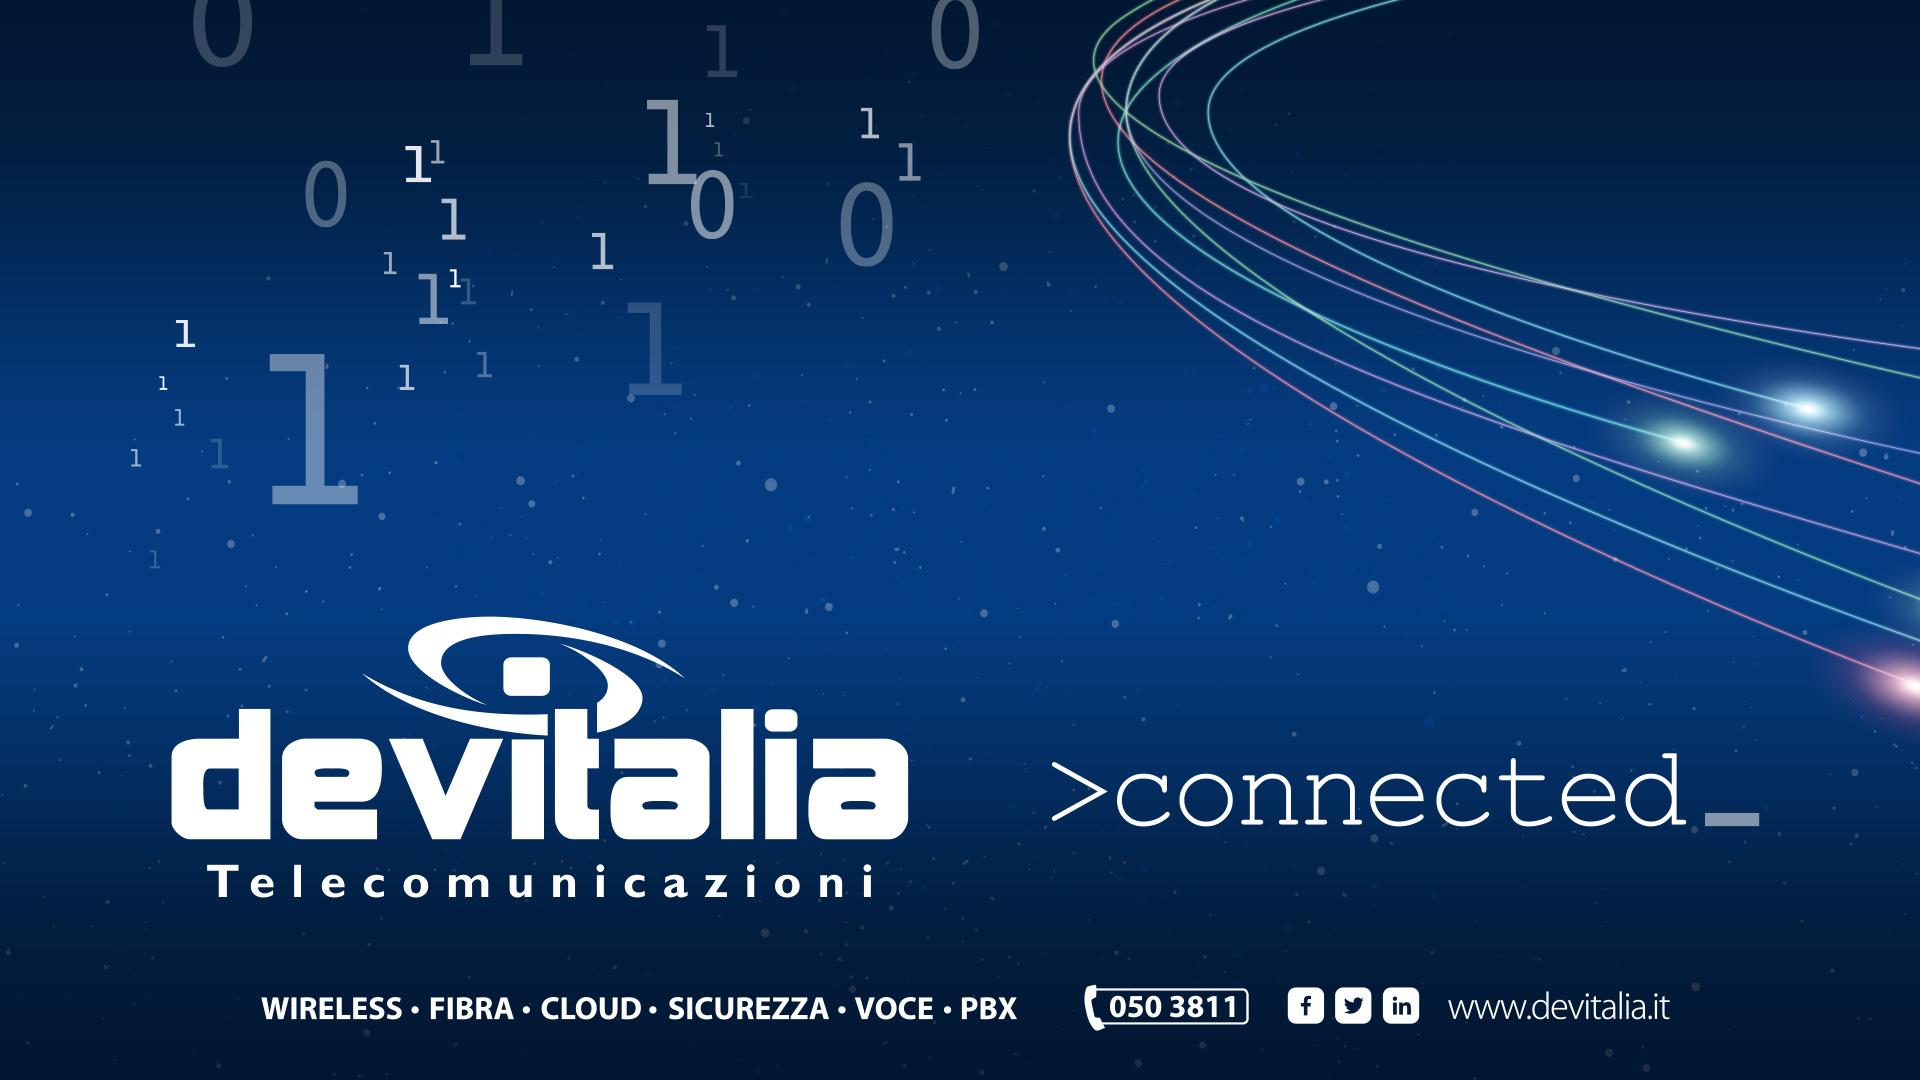 Devitalia connected